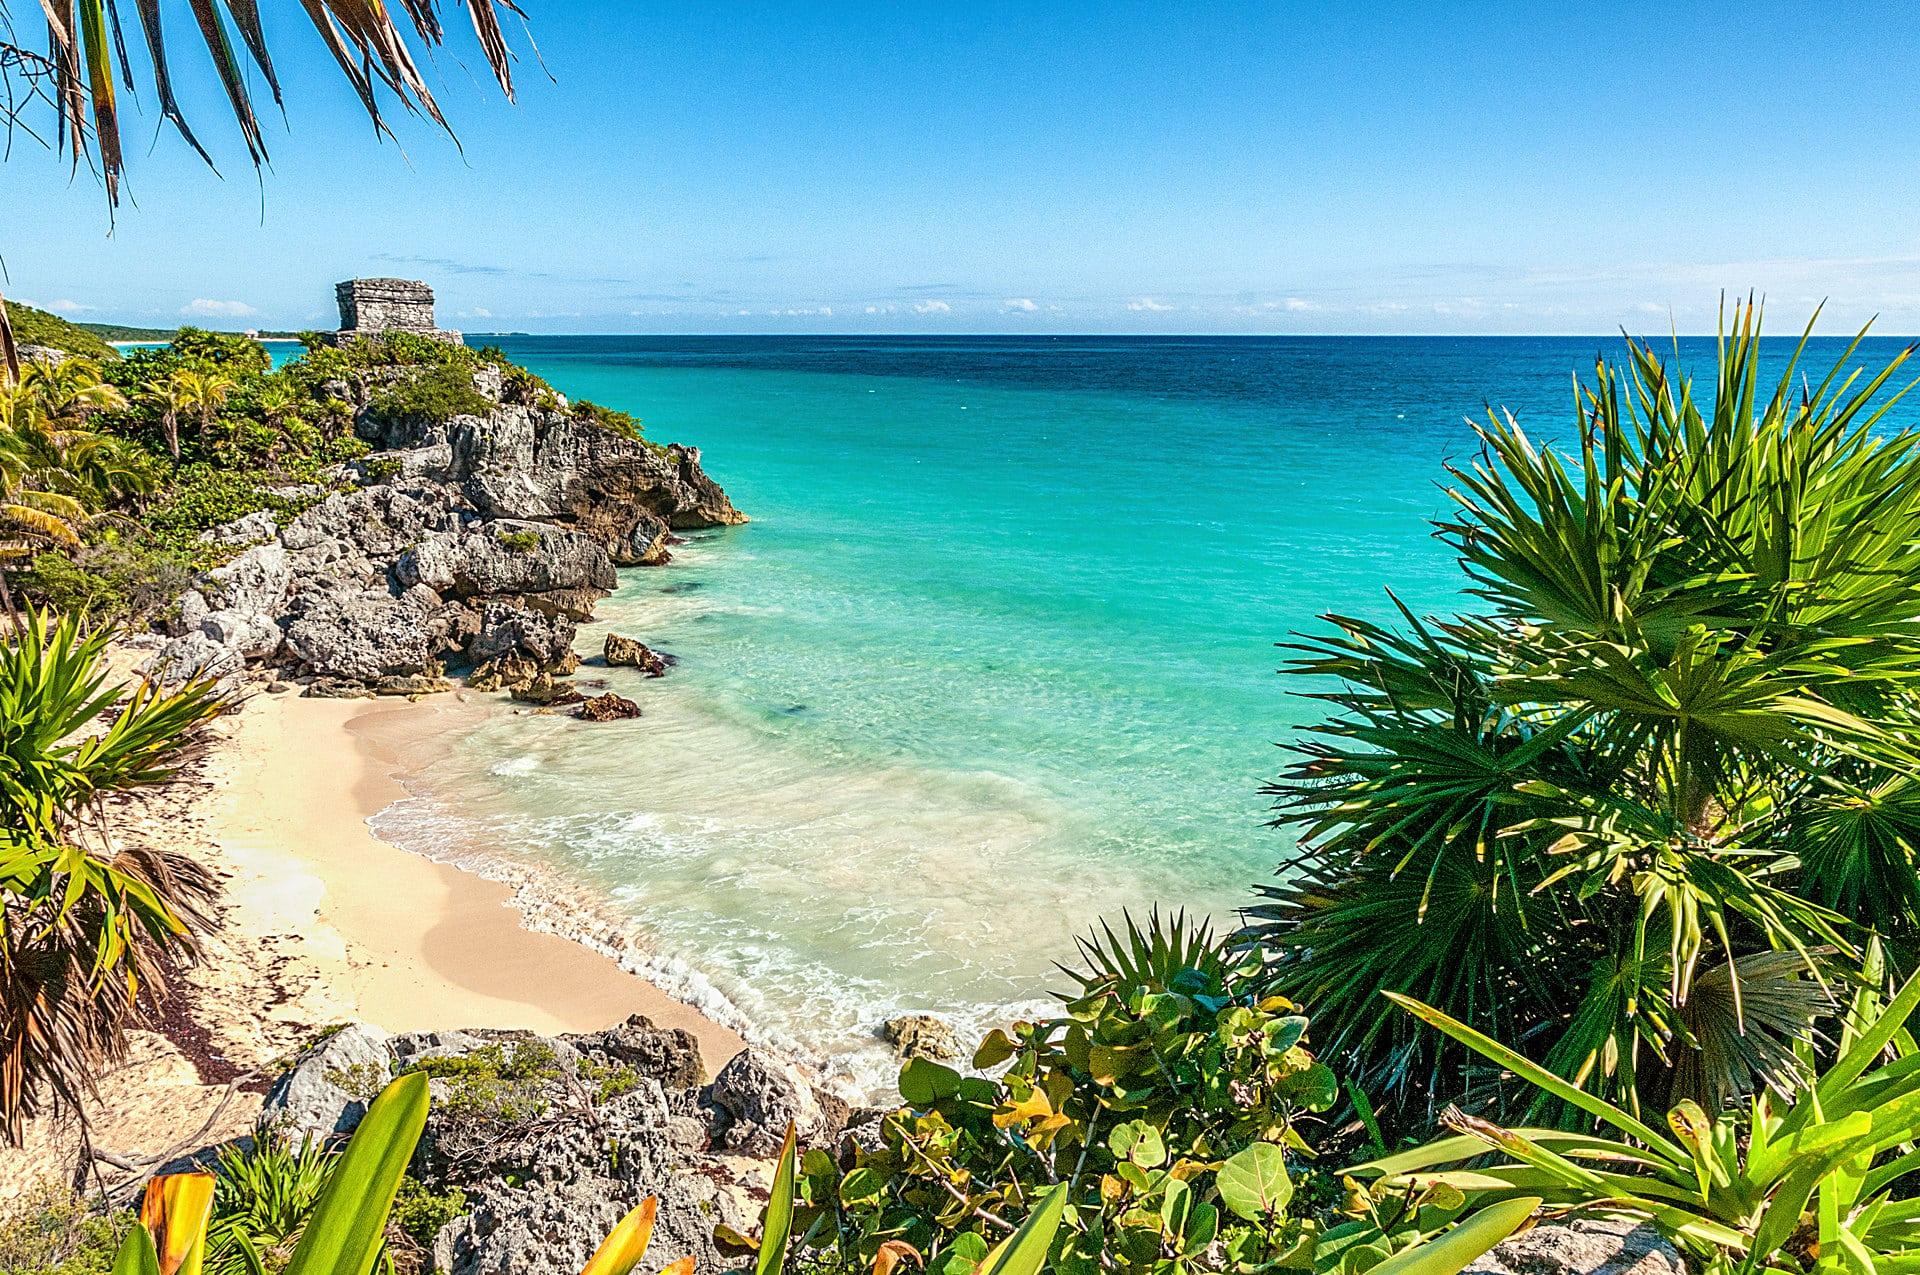 Tulum - Die Mayastätte Tulum liegt direkt an der Karibikküste